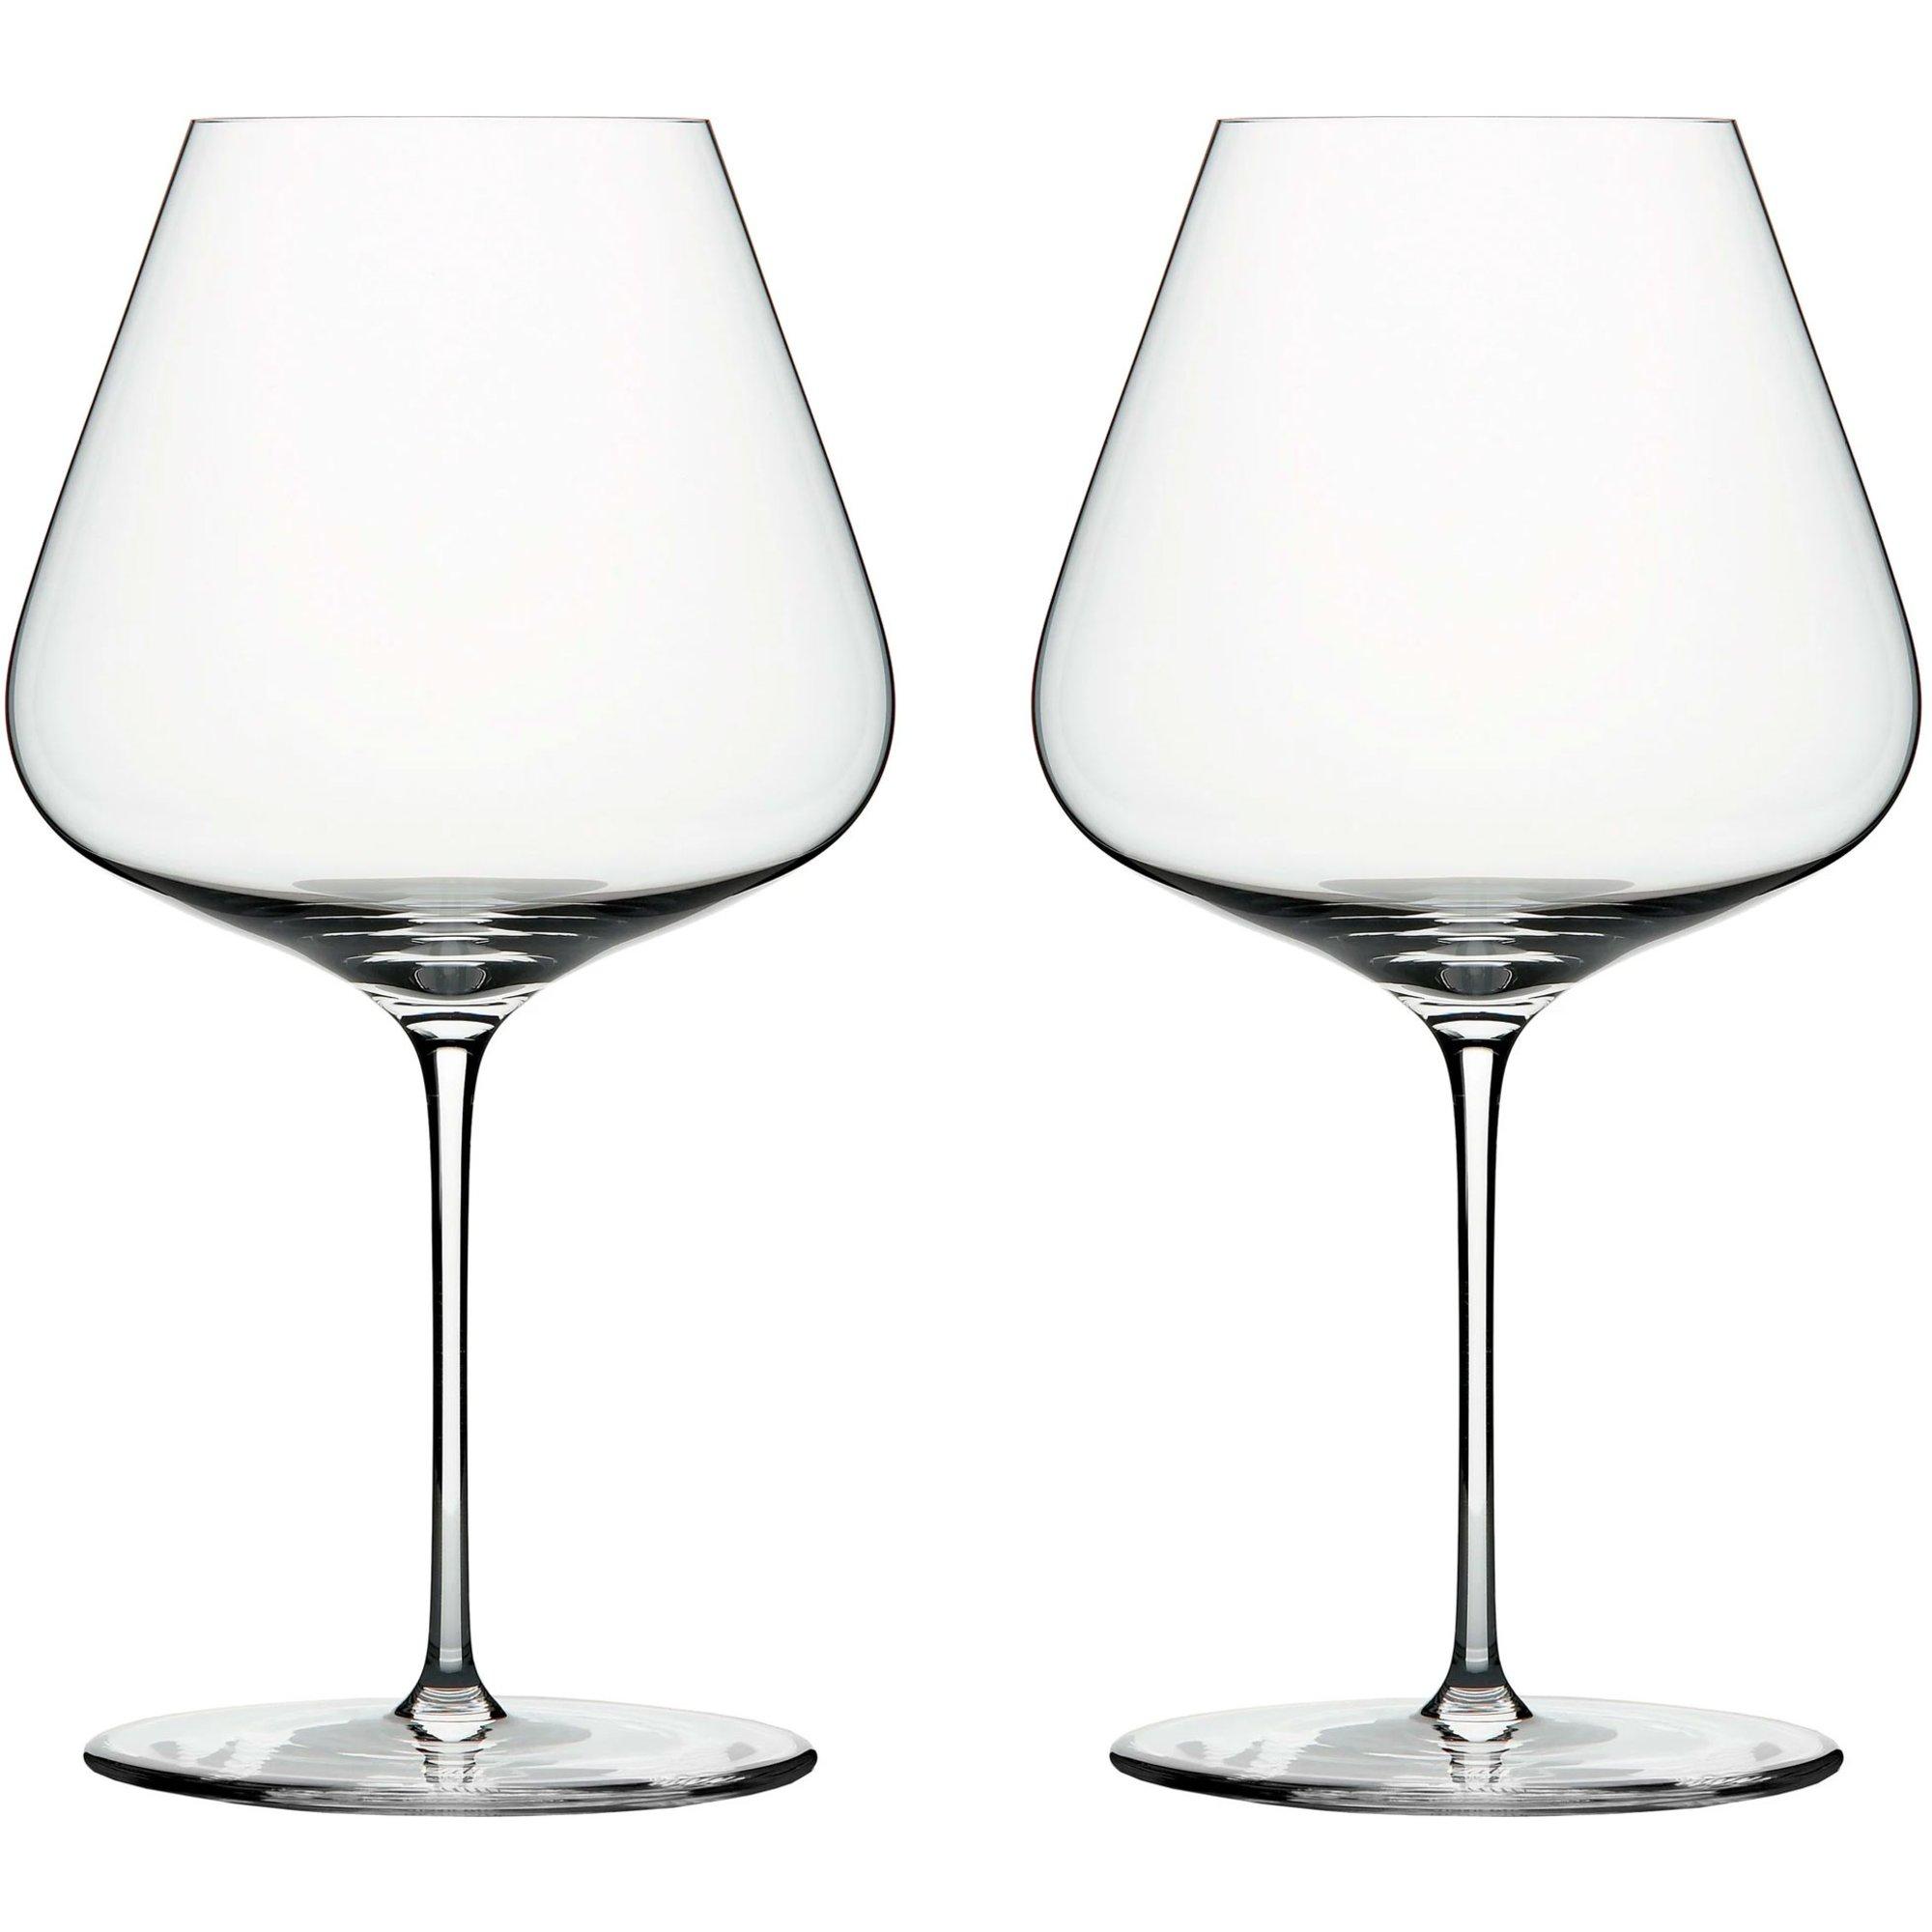 Zalto Bourgogne vinglas 960 ml. 2 st.